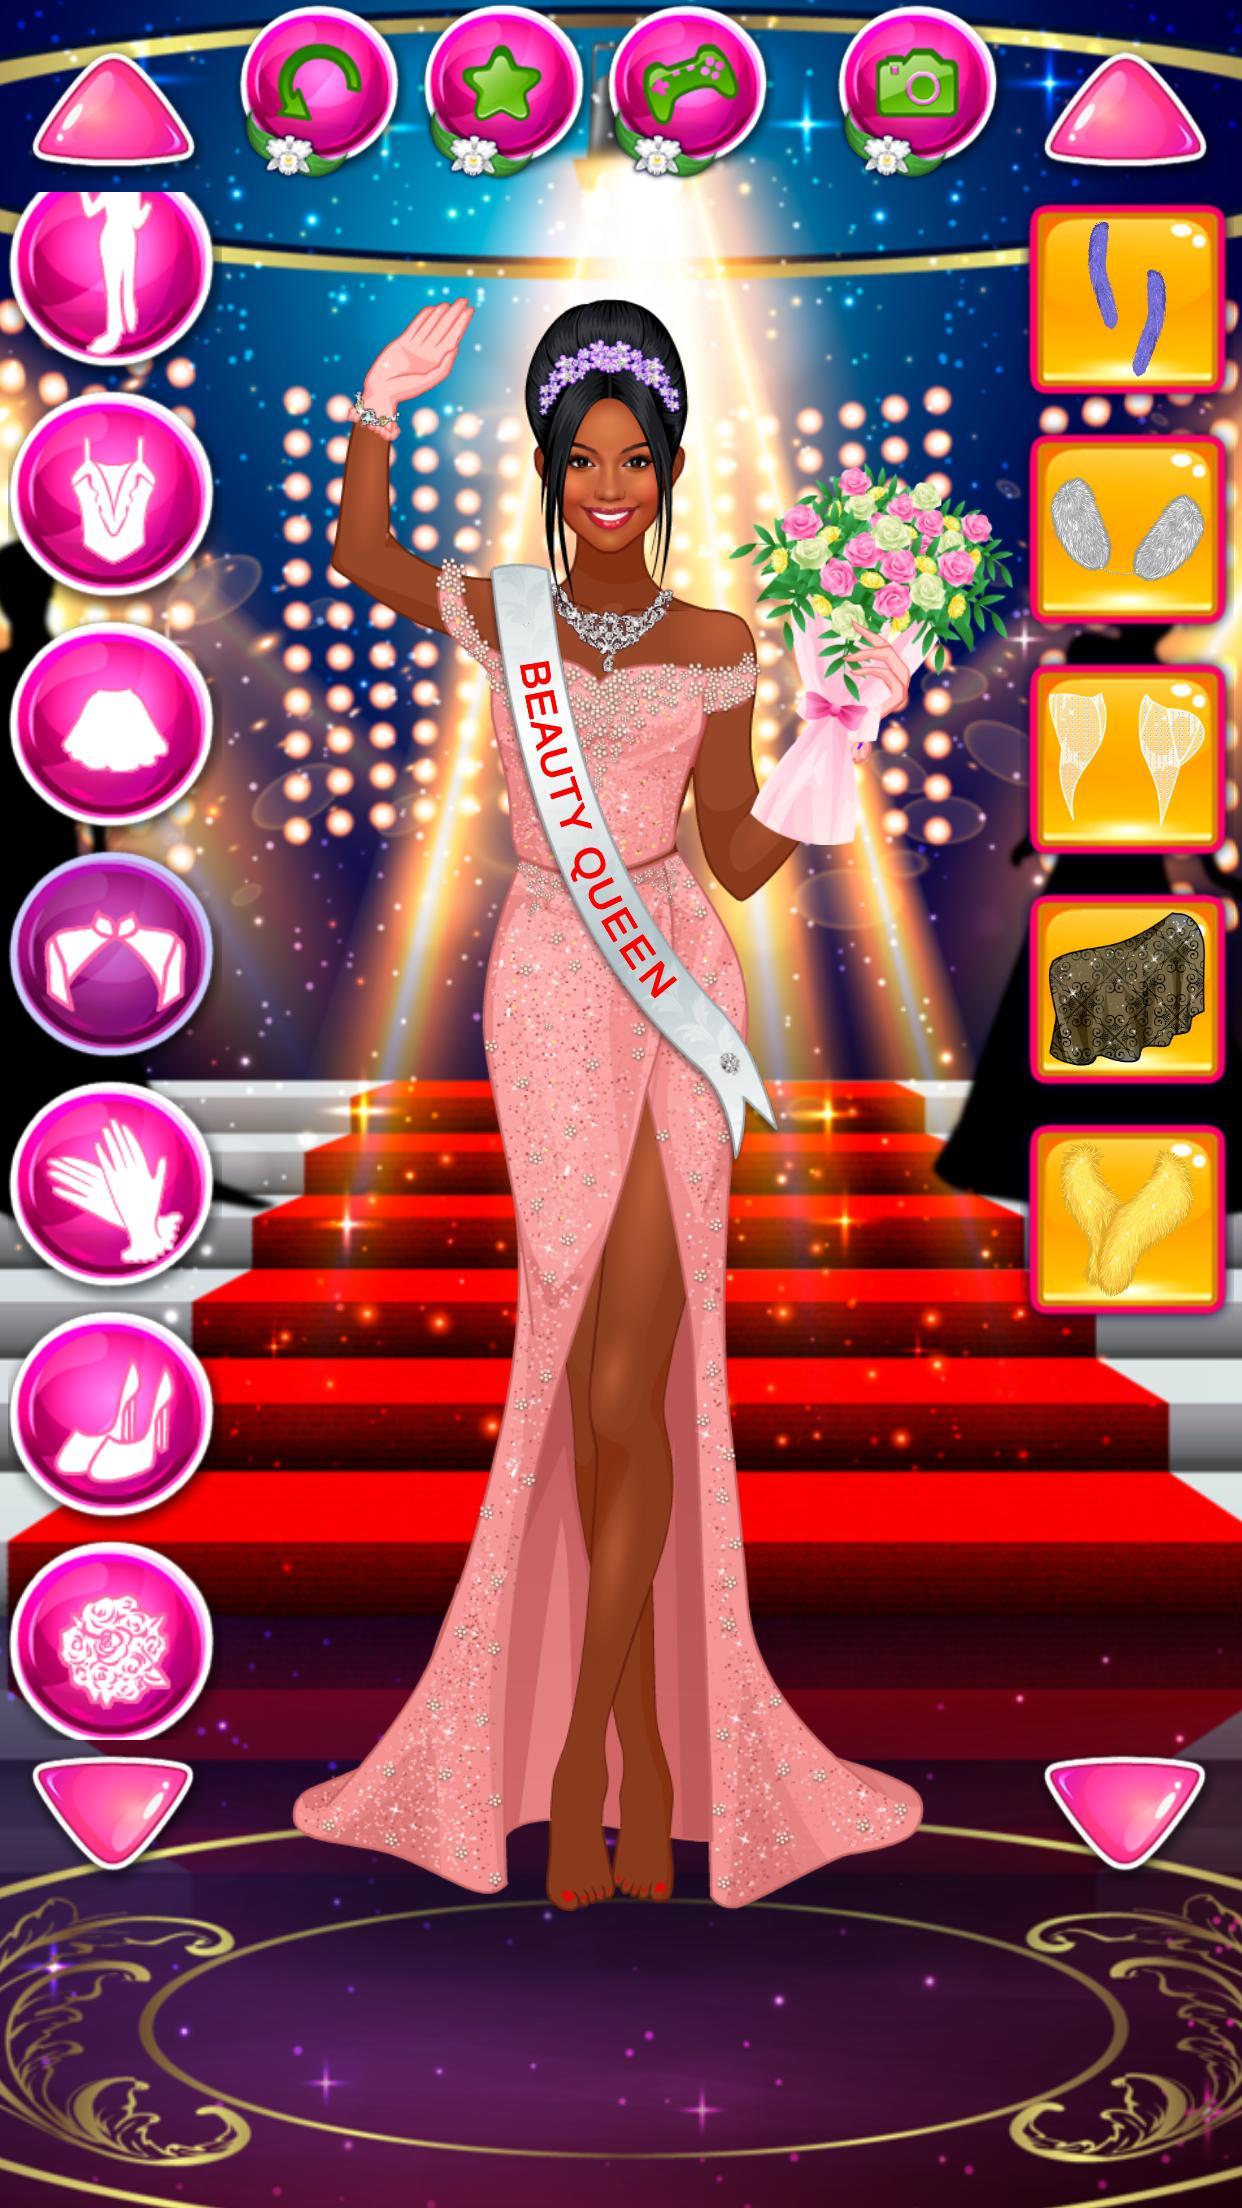 Beauty Queen Dress Up - Star Girl Fashion 1.1 Screenshot 3